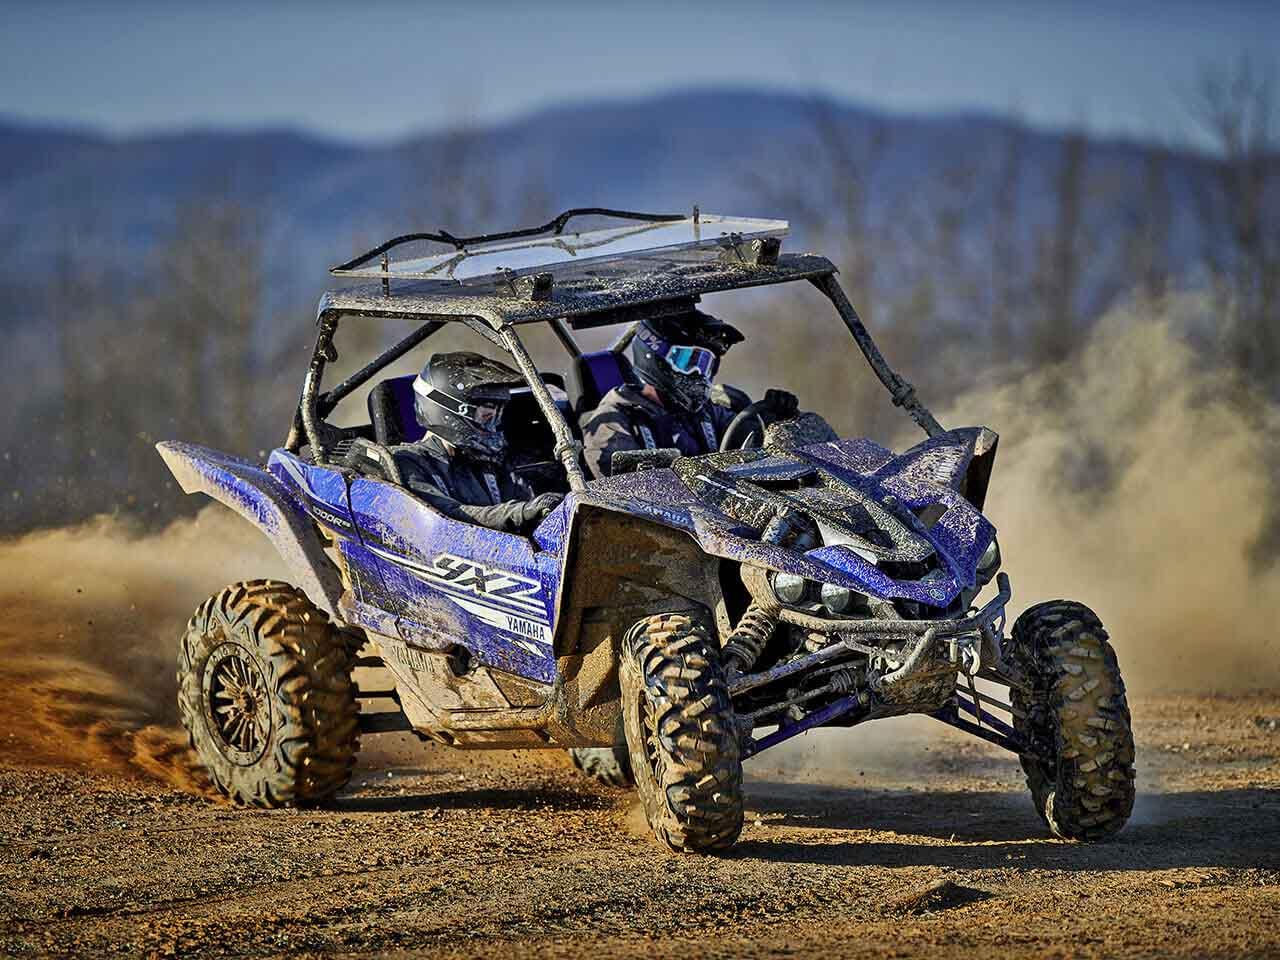 Yamaha YXZ1000R SS SE for sale in Brisbane QLD Australia